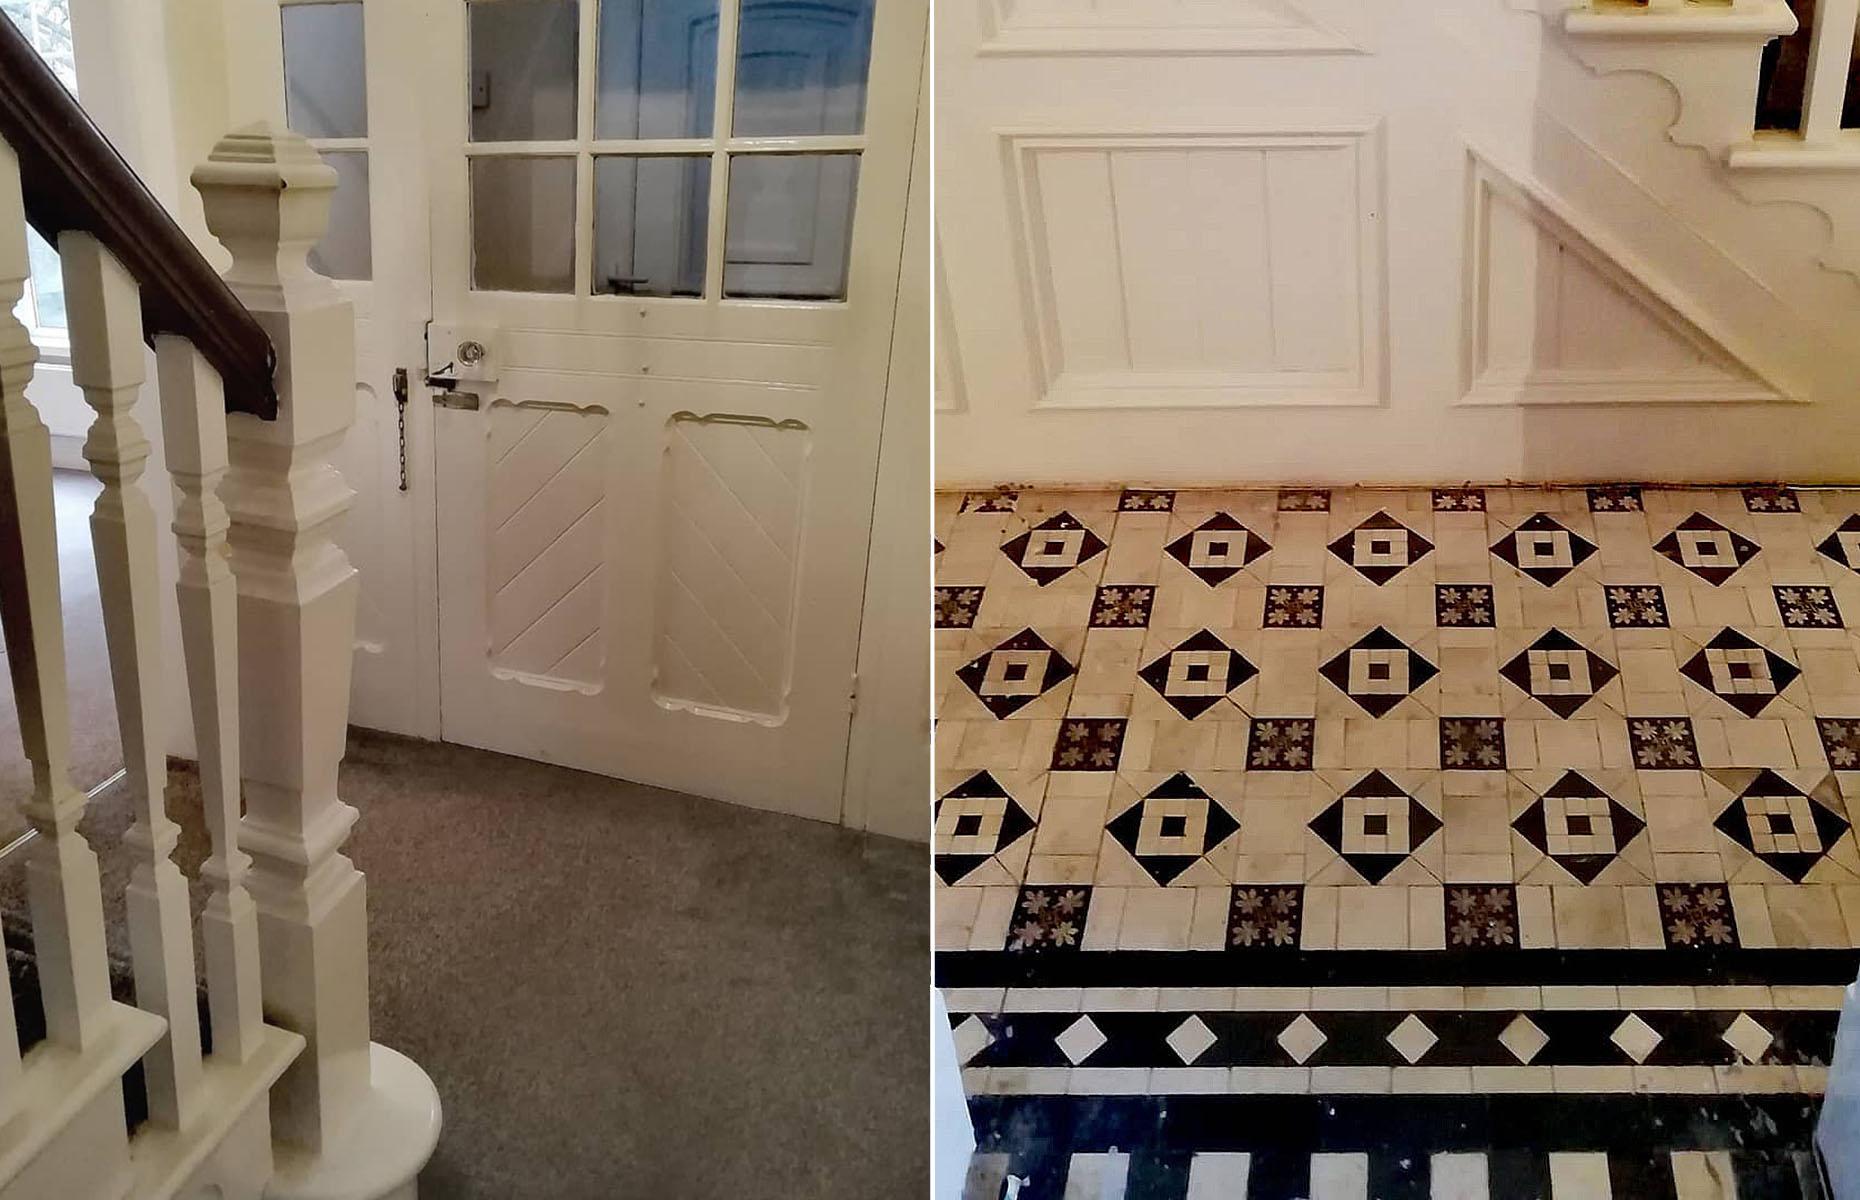 Original monochrome tiles were uncovered beneath the carpet in this hallway. Image: @renovating_brynteg / Instagram